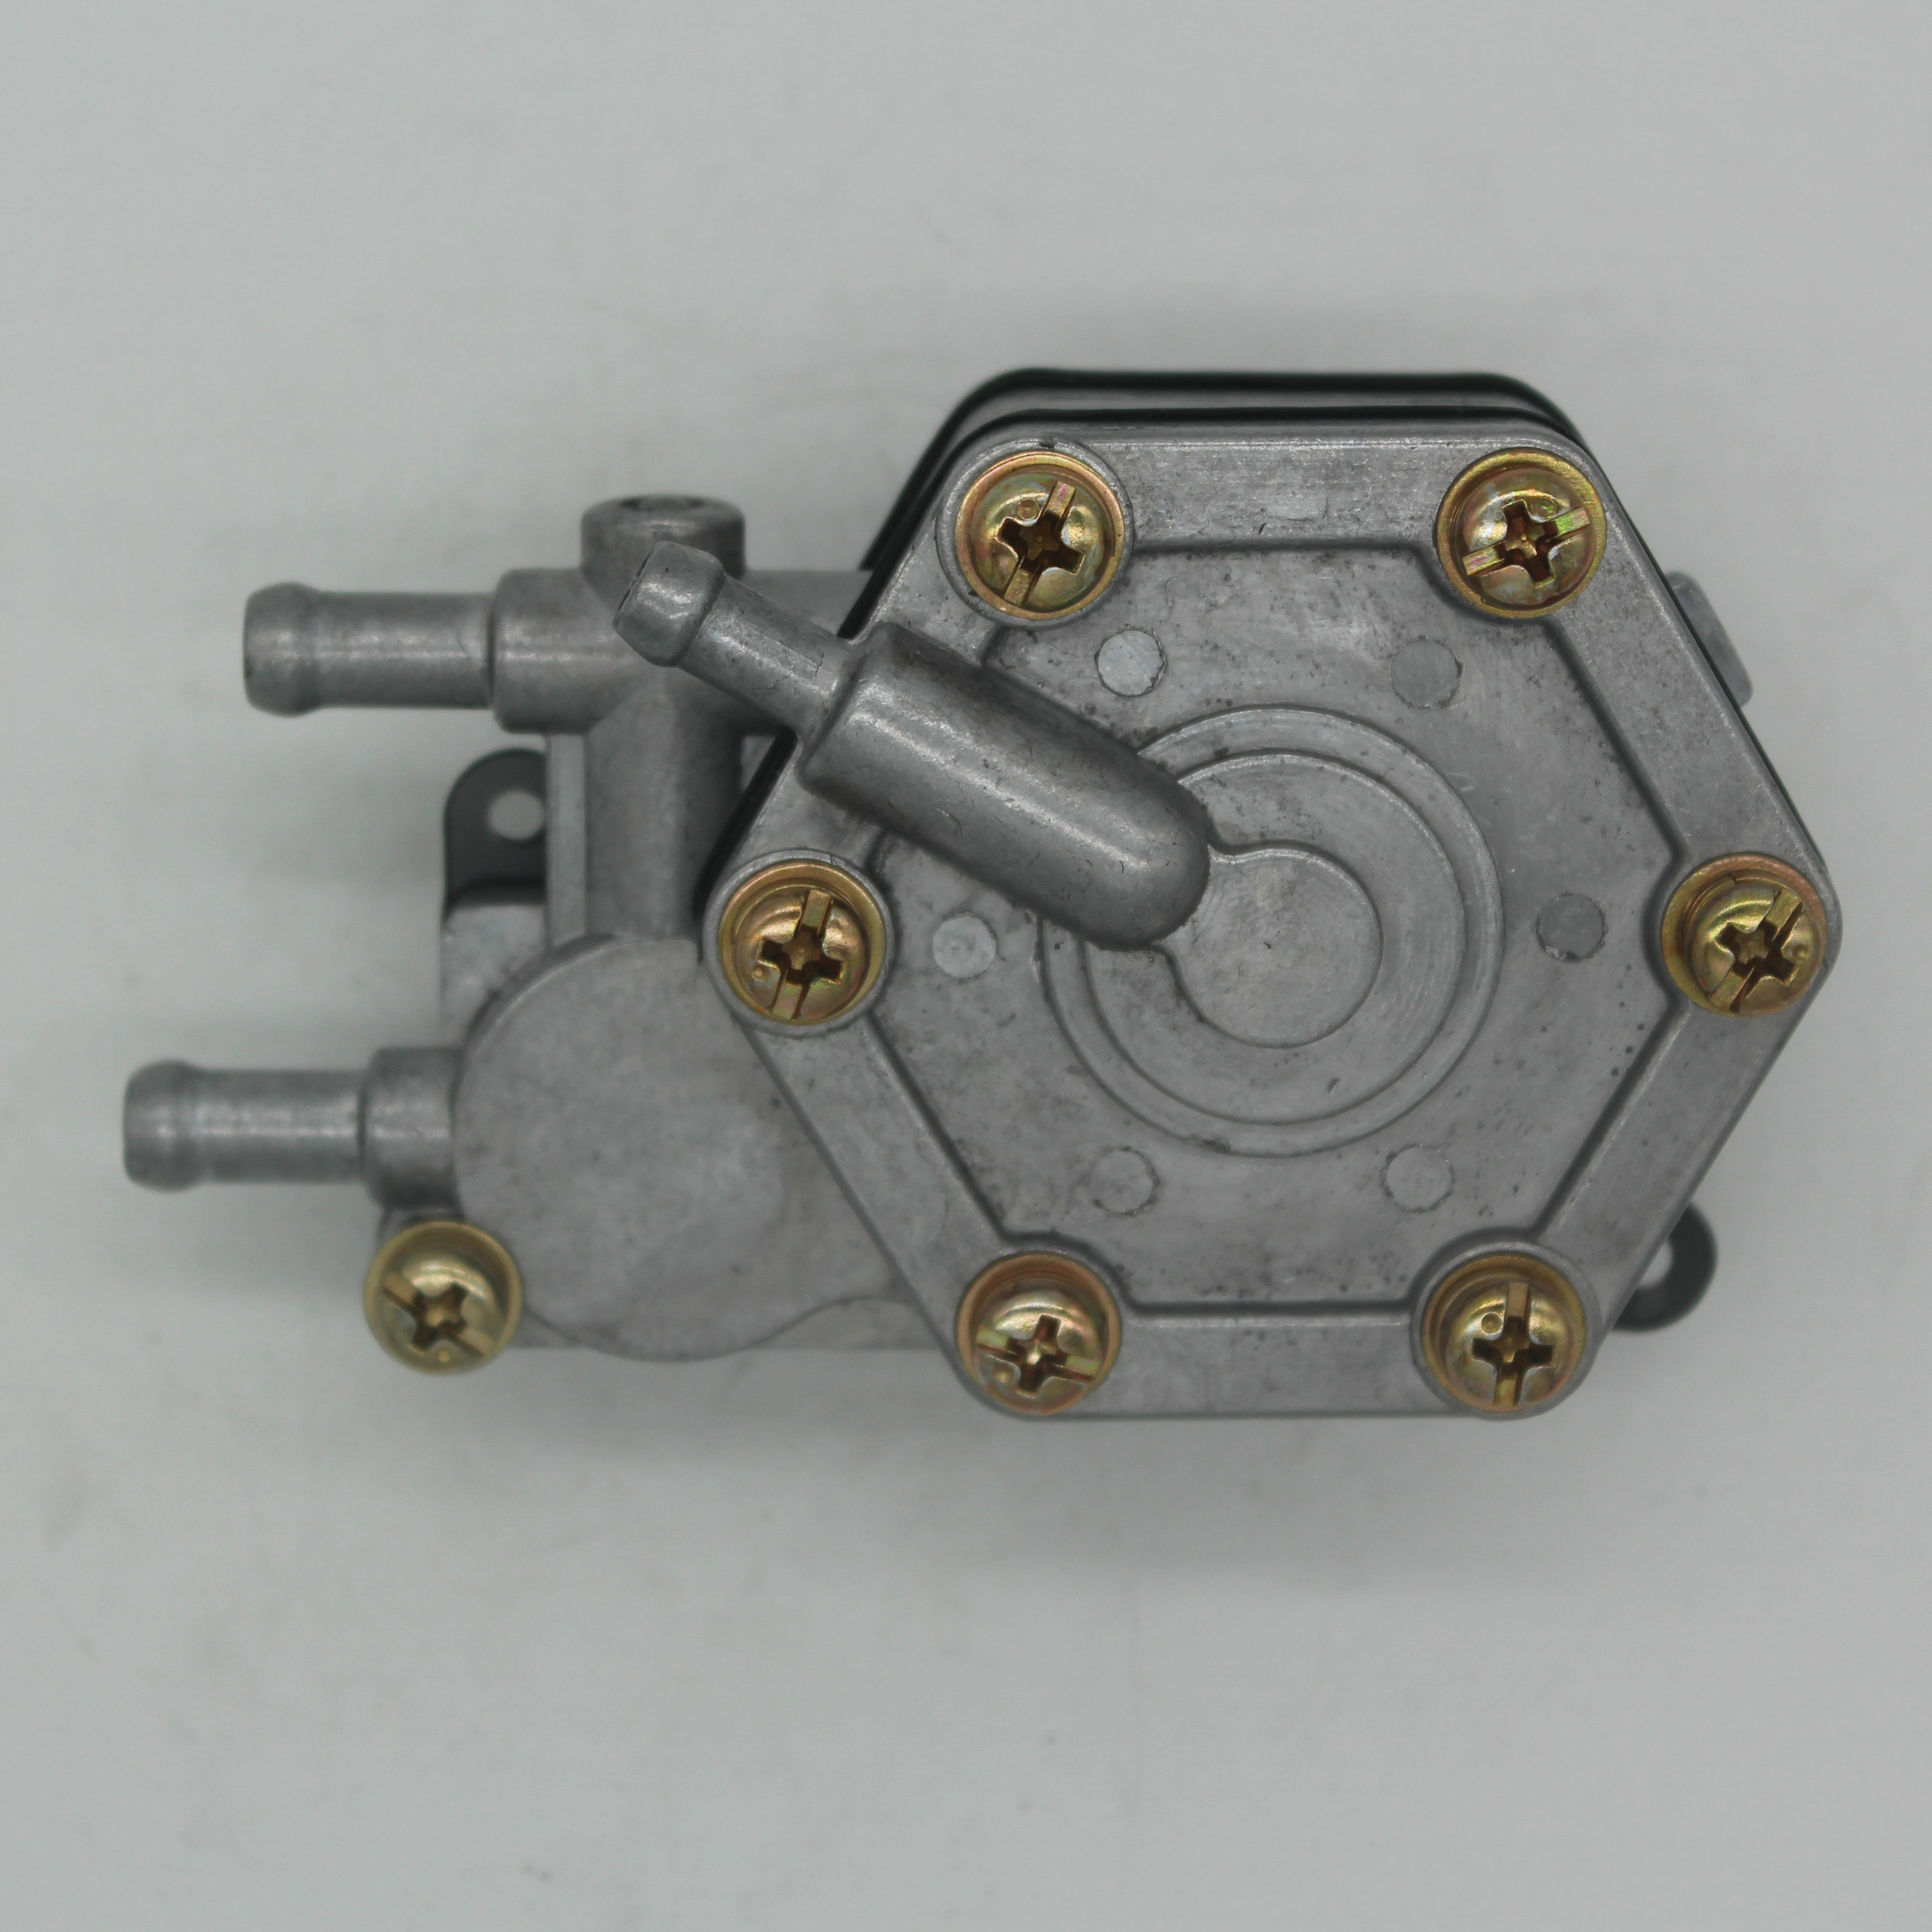 New Arrival Fuel Gas Pump for Polaris spotrs man 350 400 600 700 outlaw predetor ATV